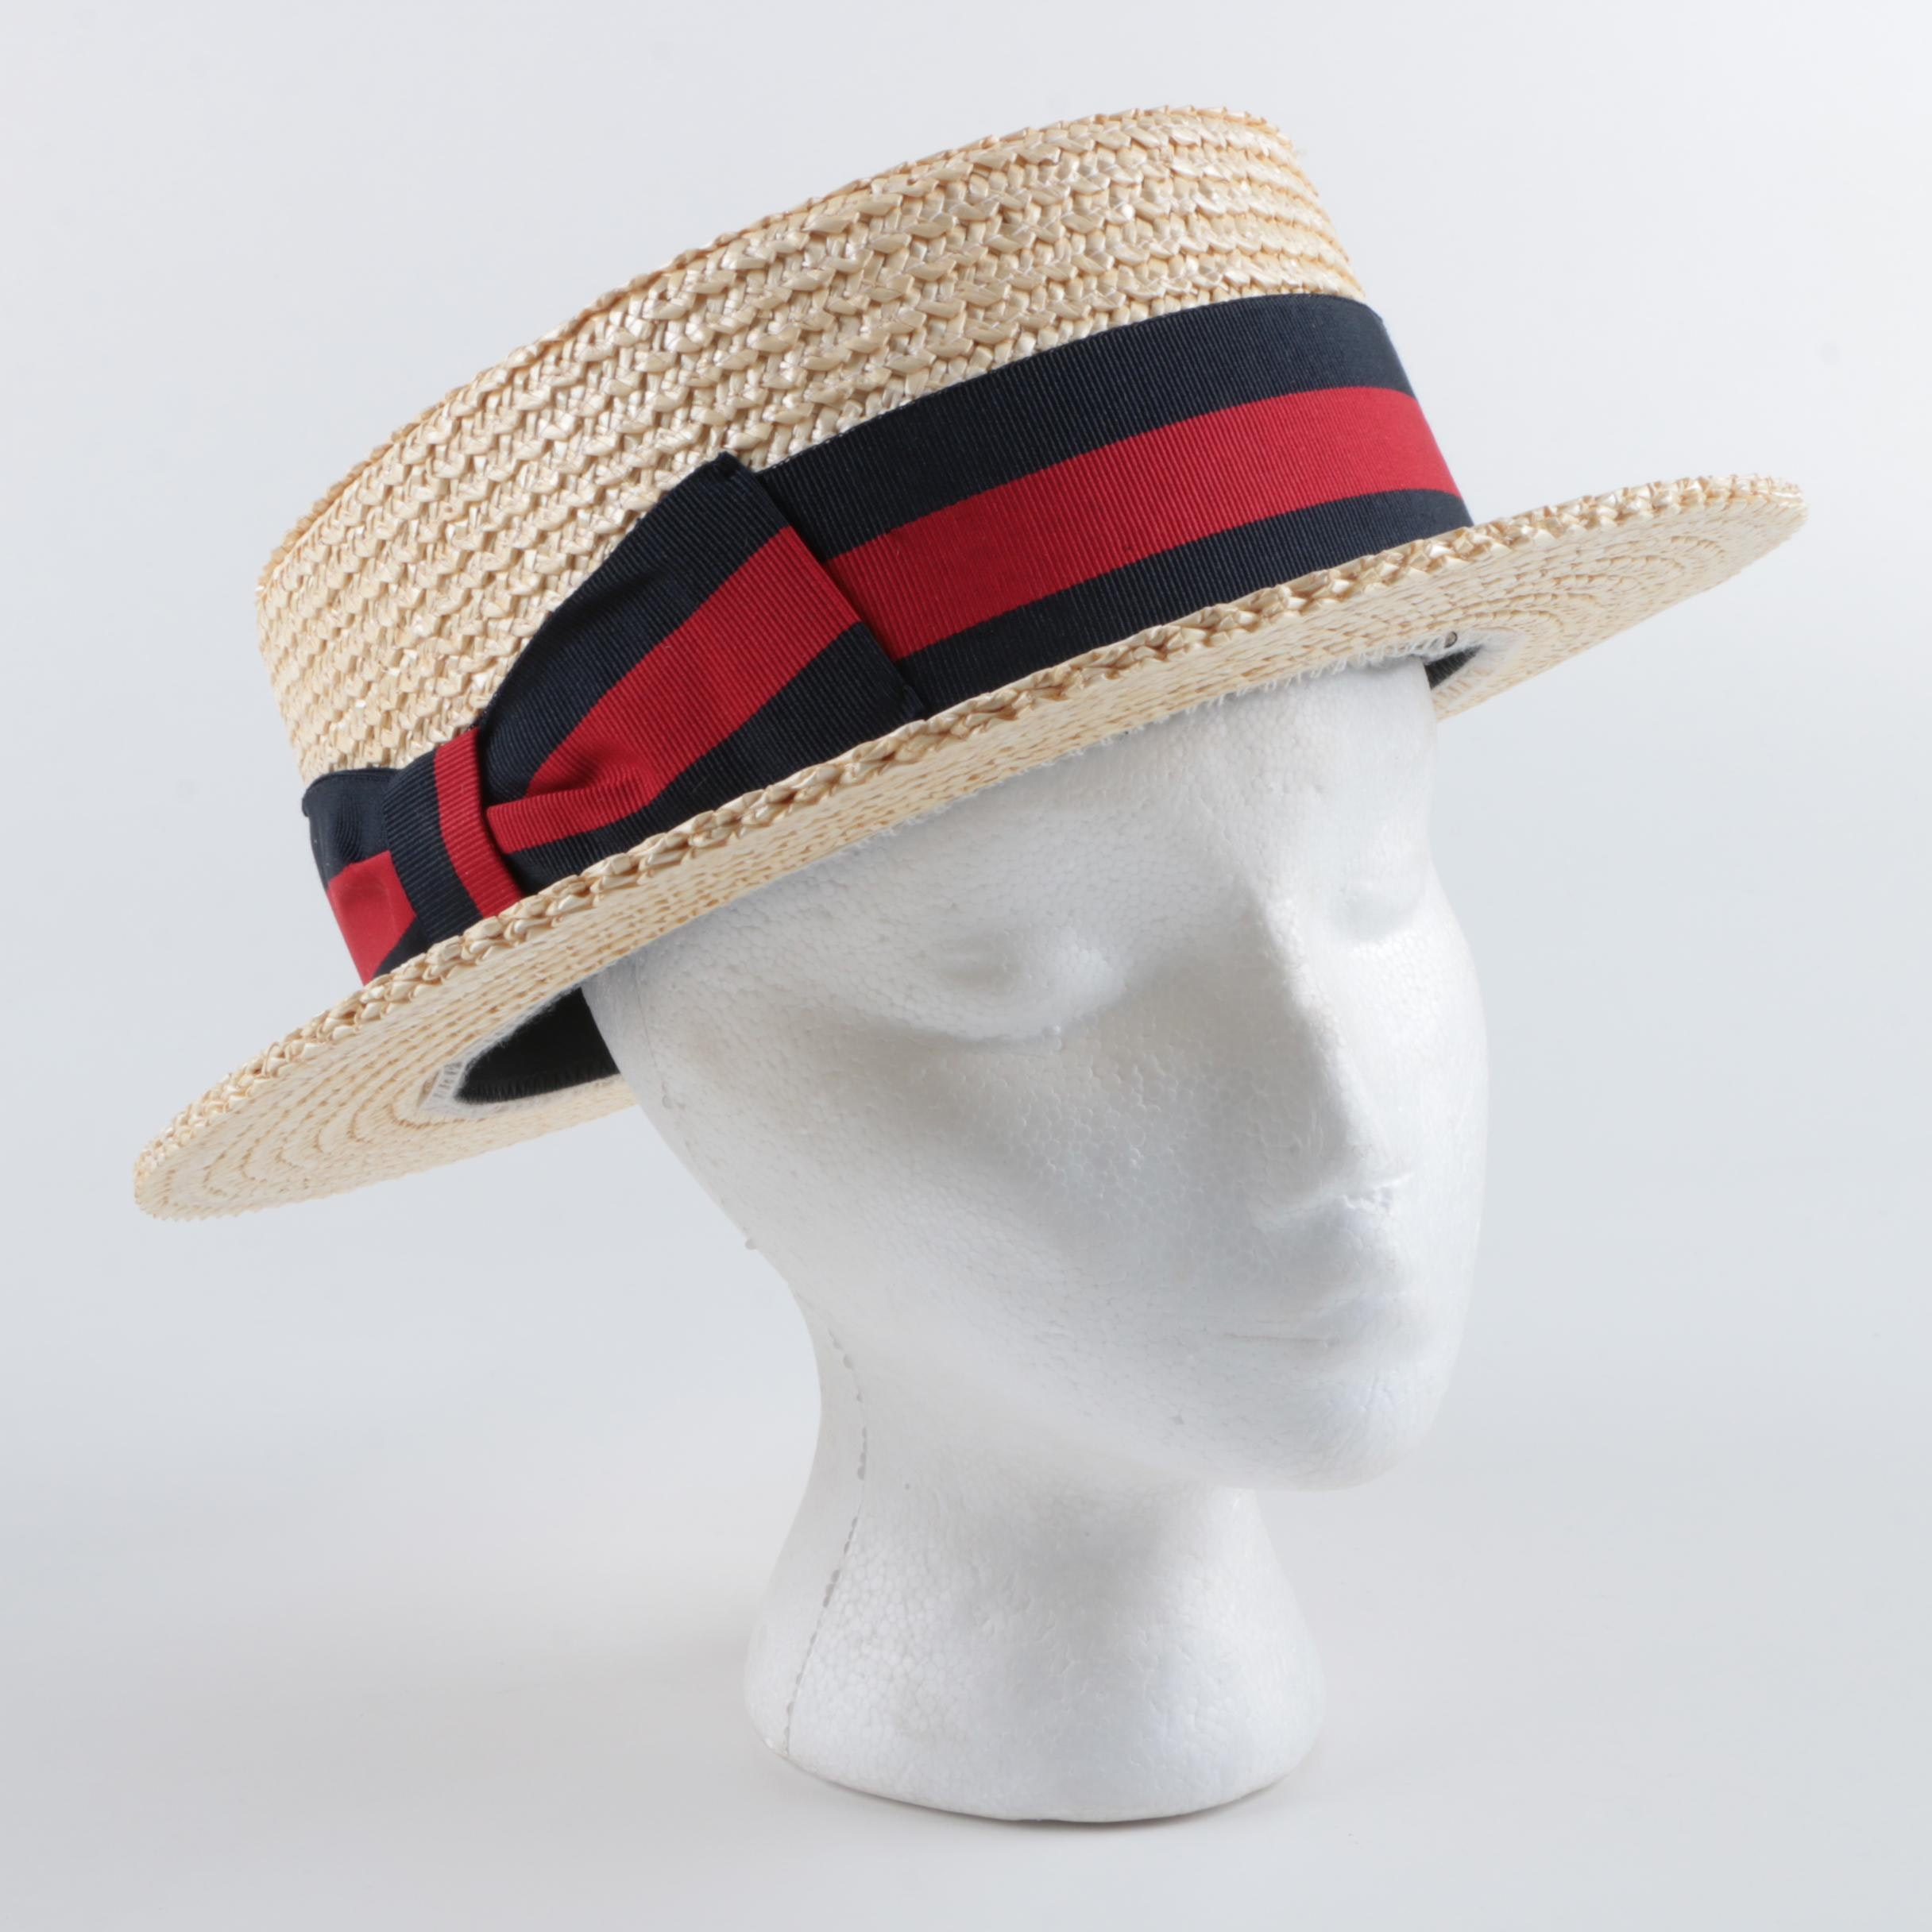 Ponte Rialto Italian Made Gondala Woven Straw Hat